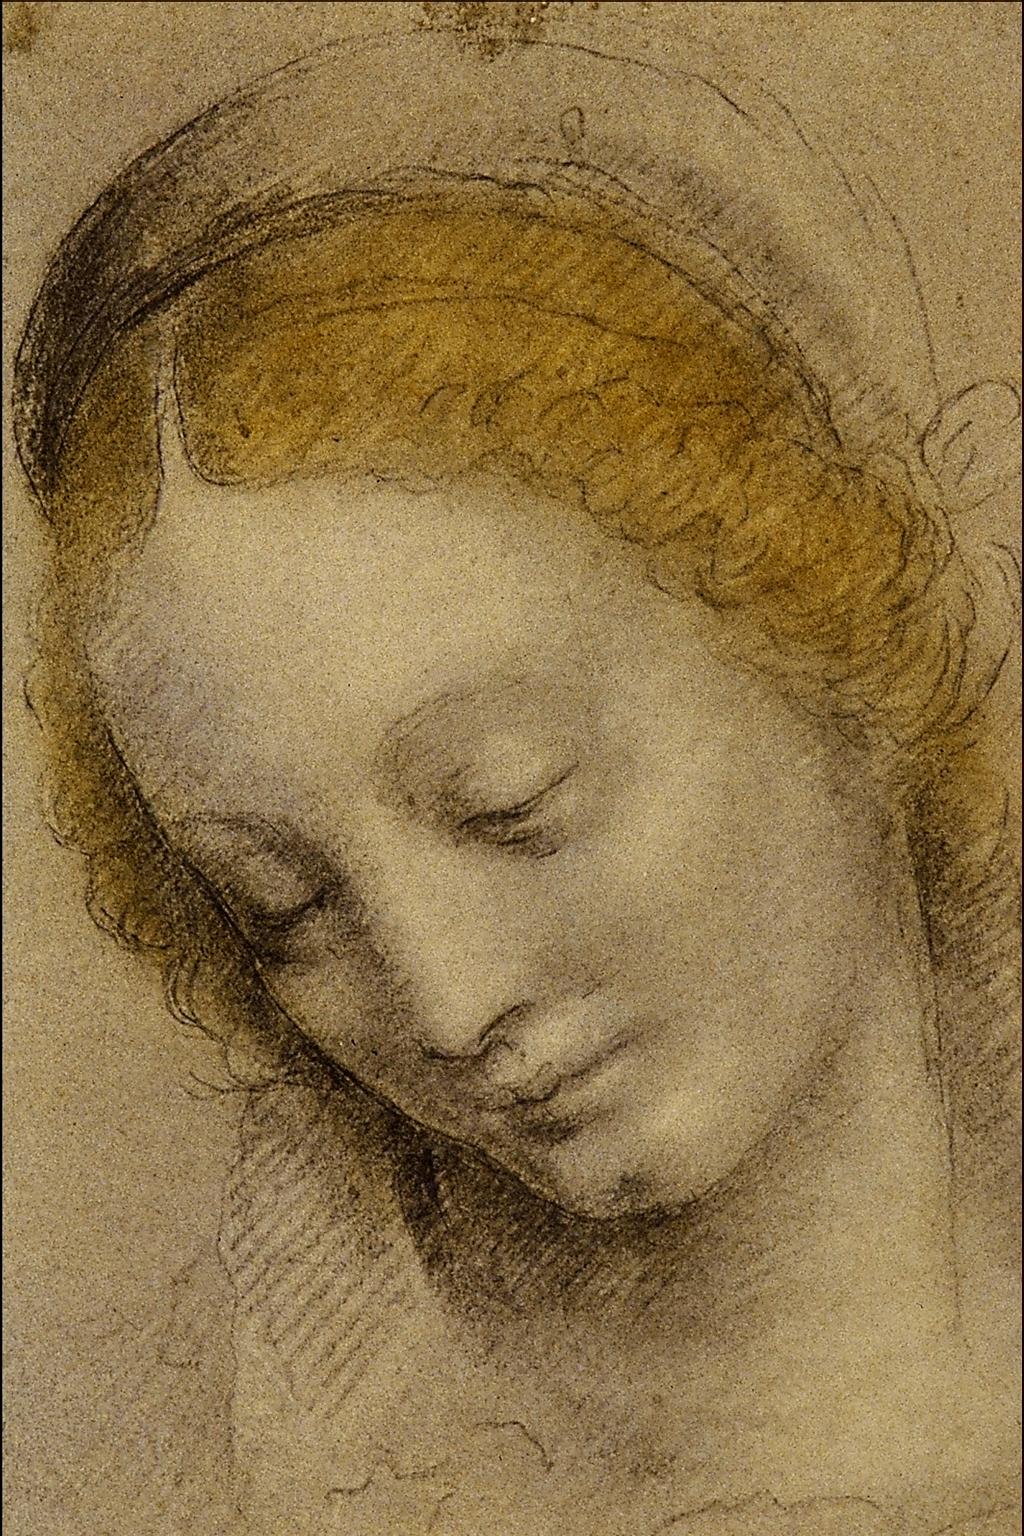 Head_of_a_Woman_-_Bernardino_Luini.png?uselang=fr